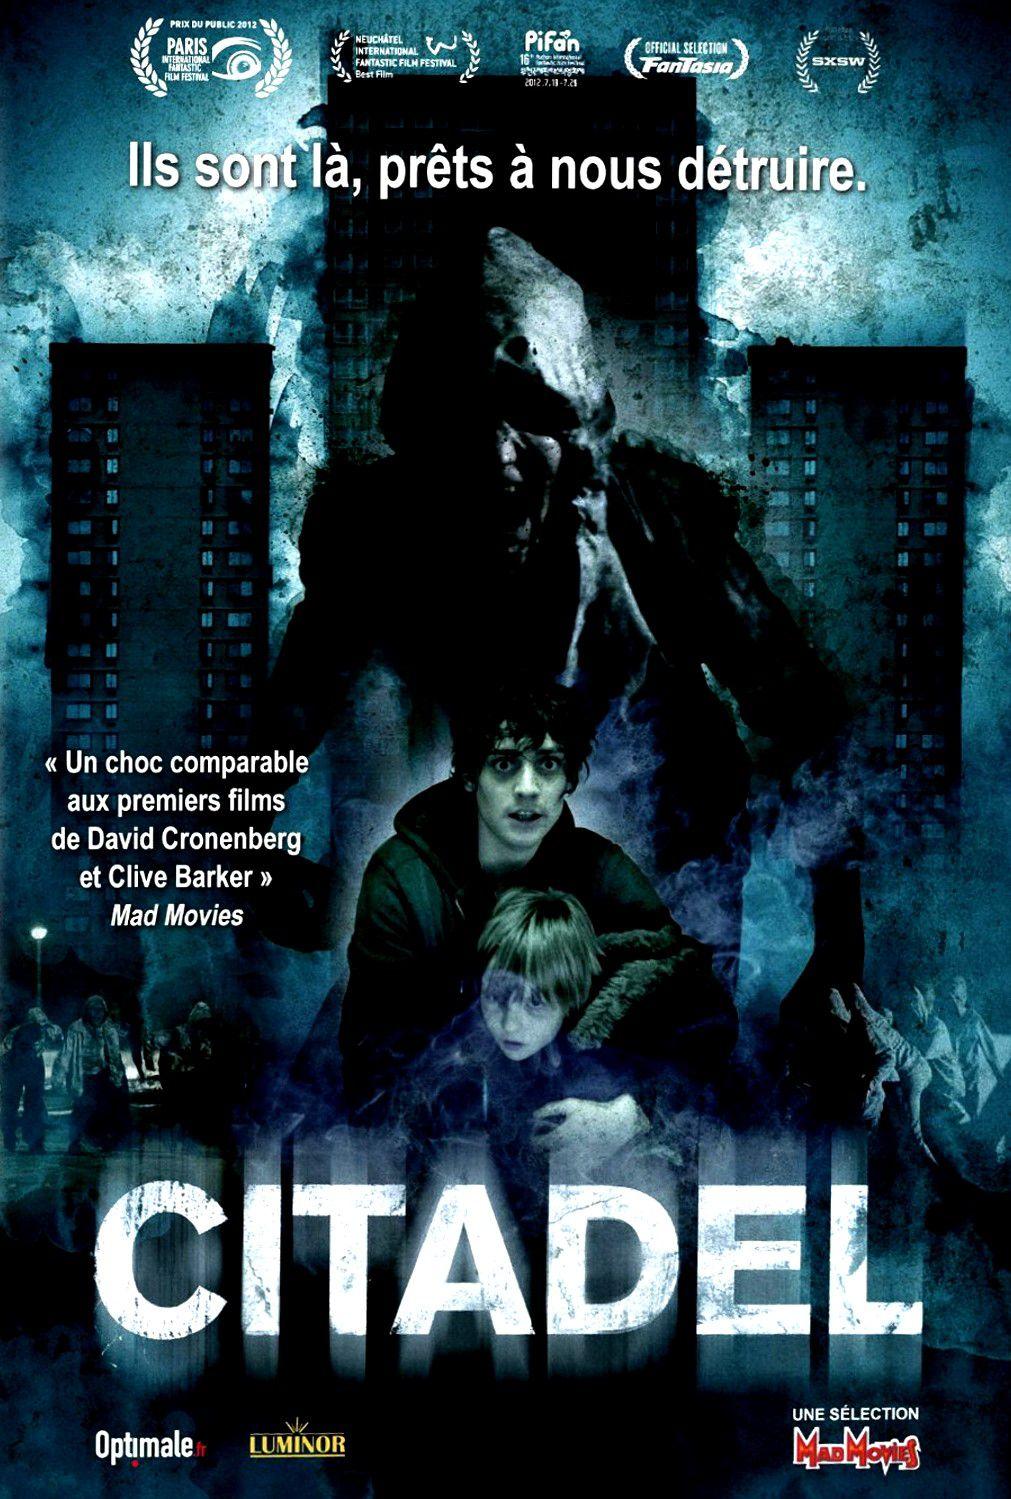 Citadel - Film (2012)